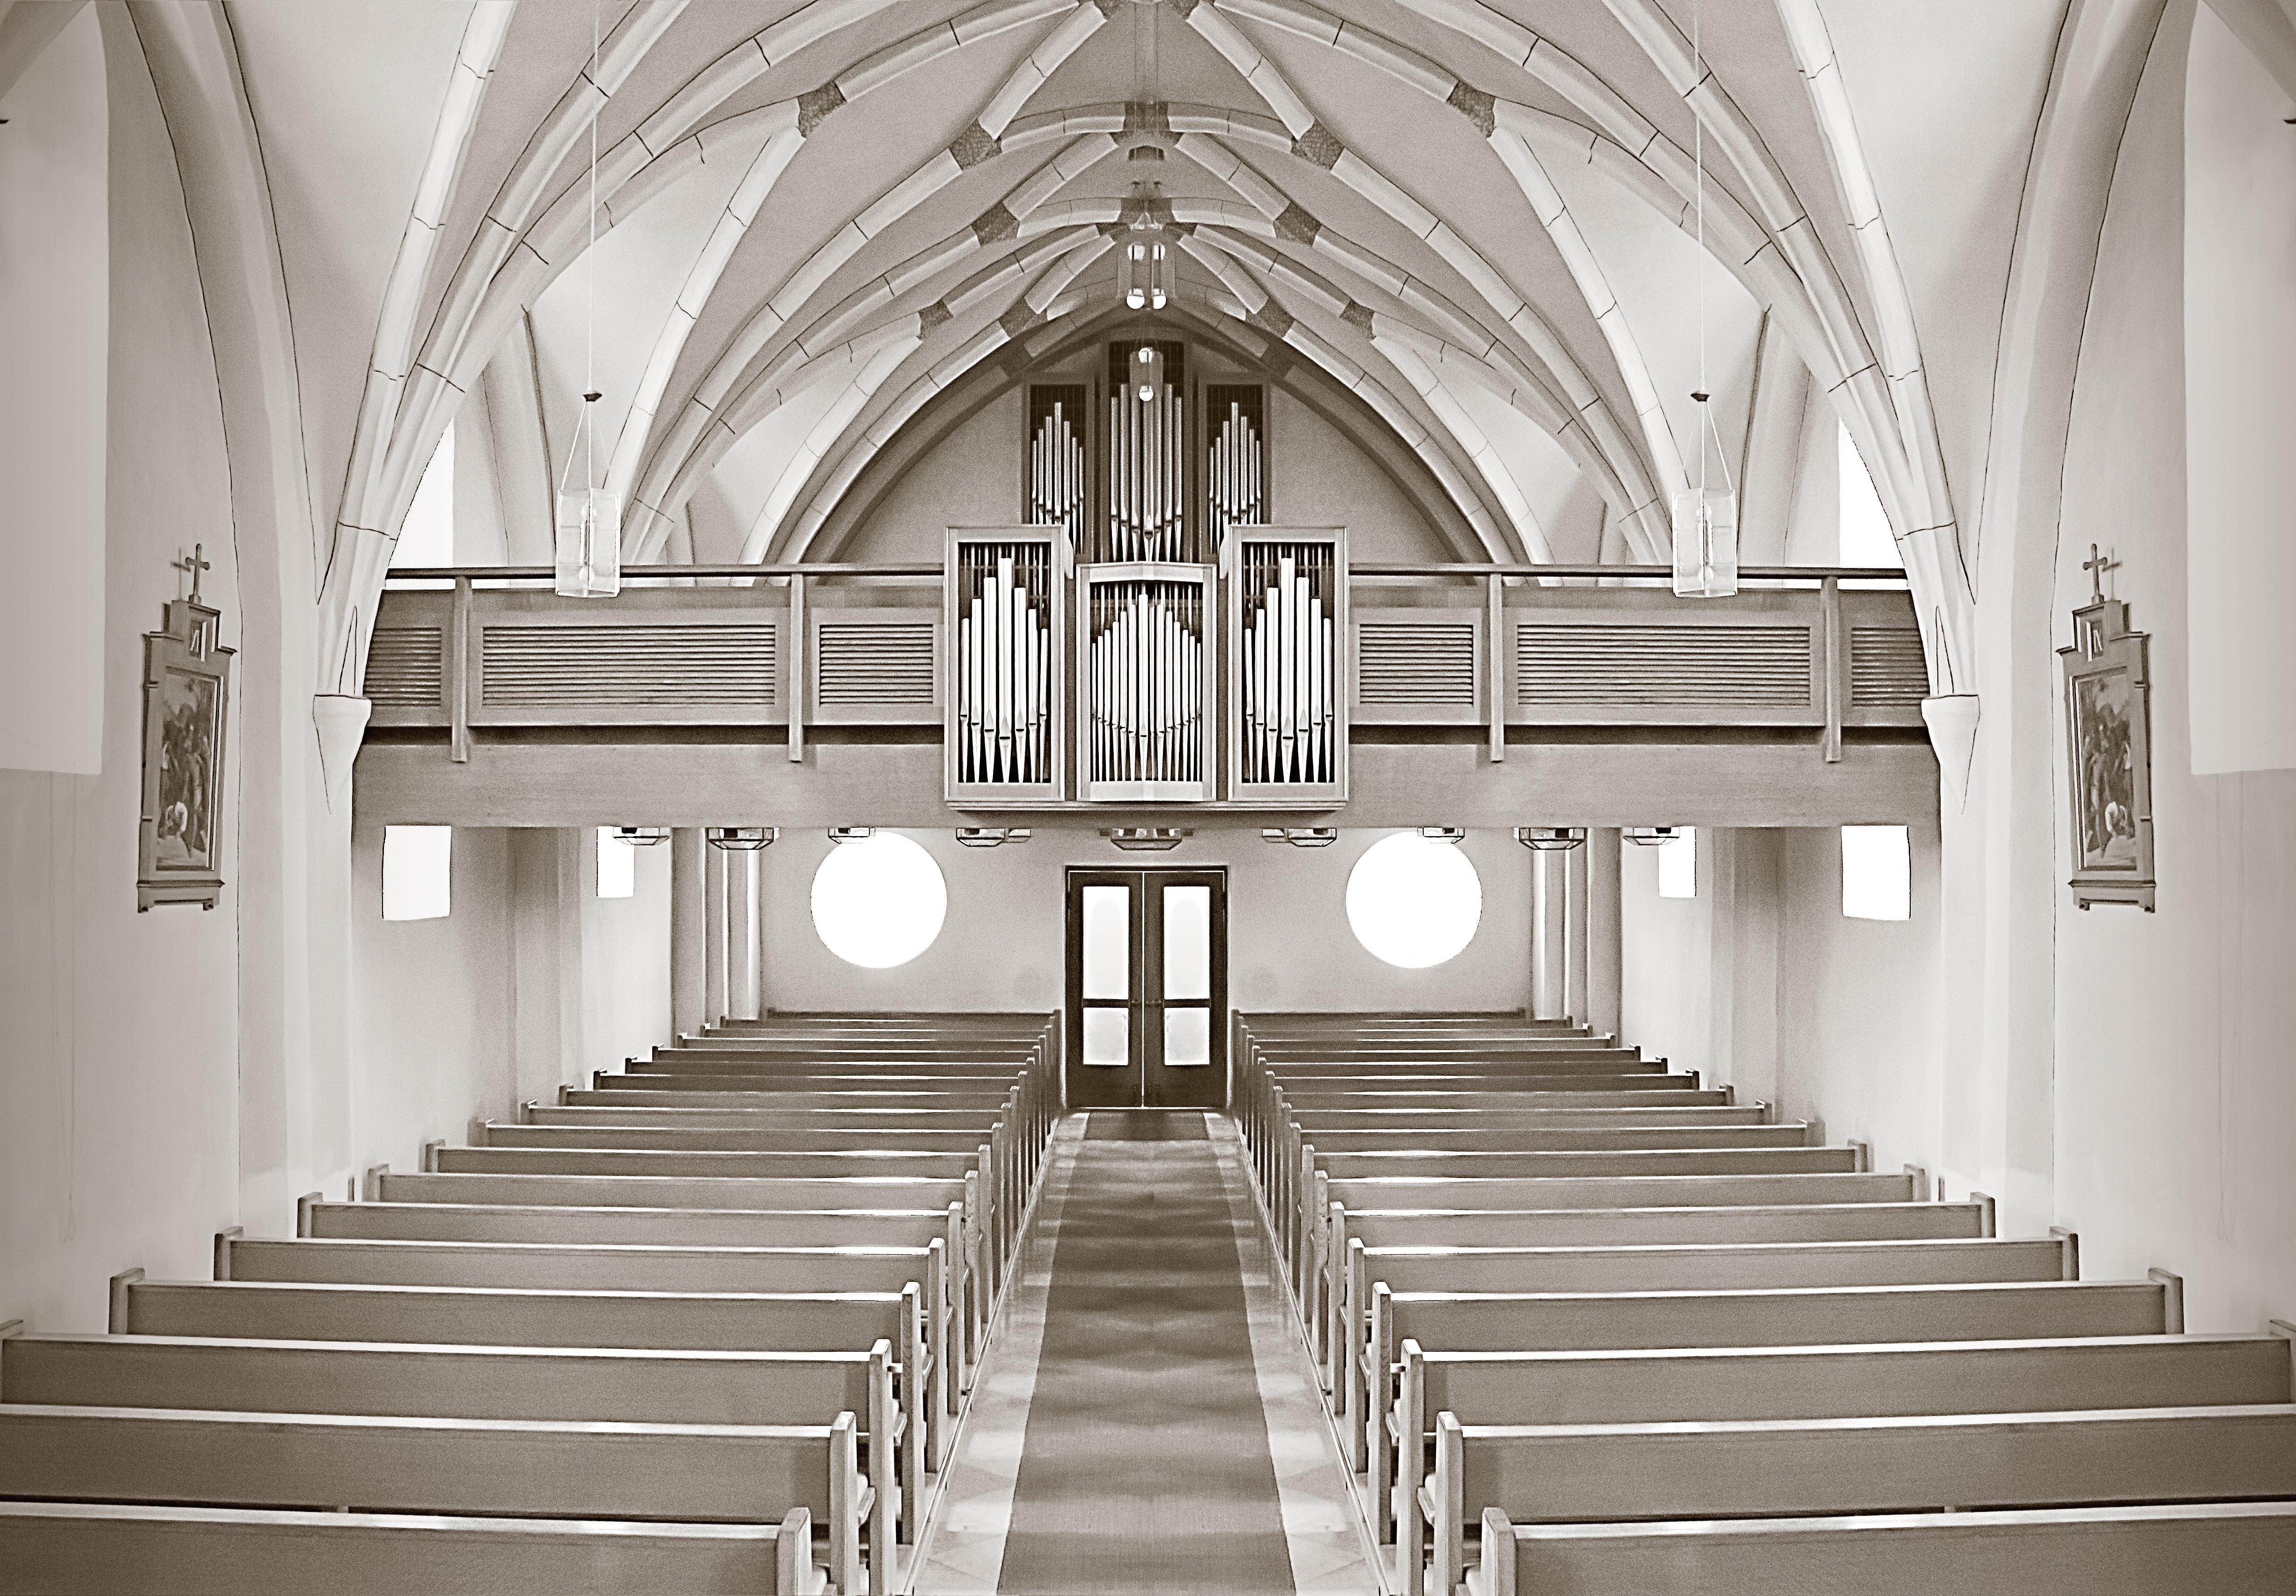 Religious Building, Arches, Architecture, Building, Church, HQ Photo